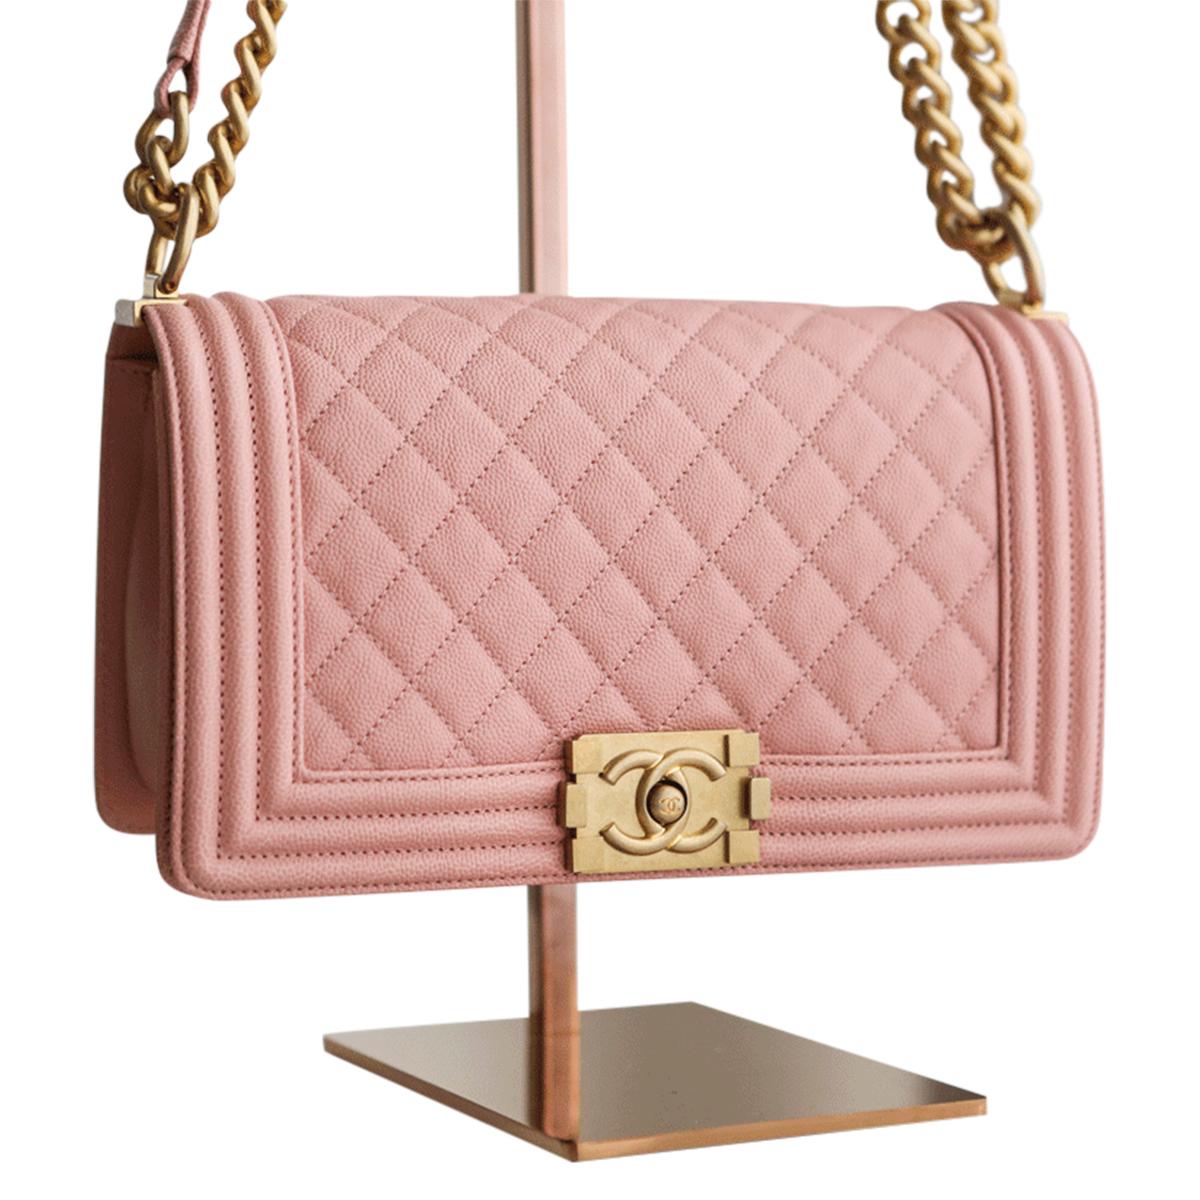 e618700d Chanel Boy Bag